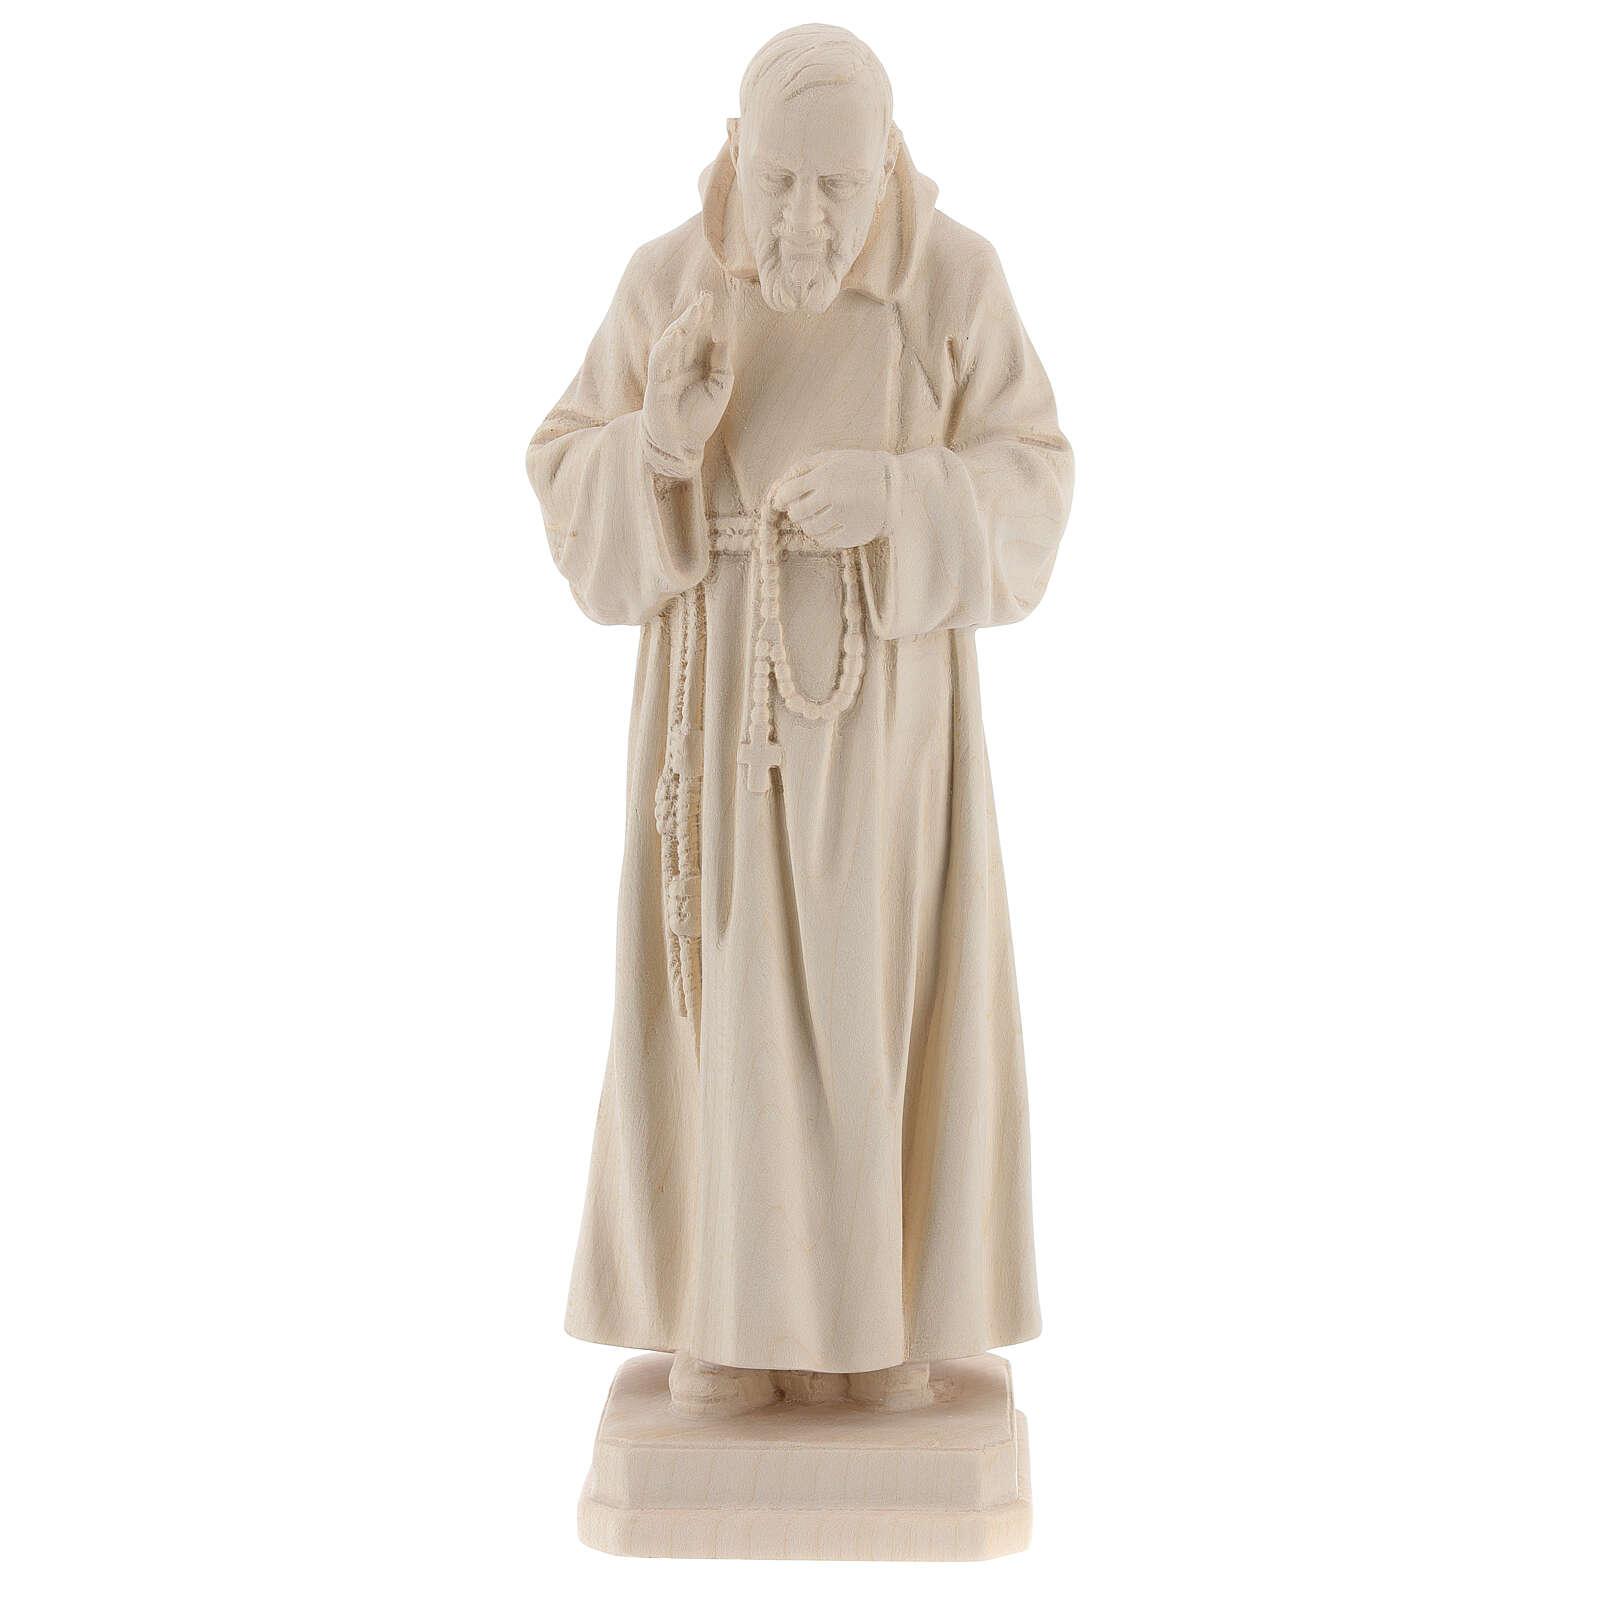 Valgardena statue of Saint Pio in natural wood 4